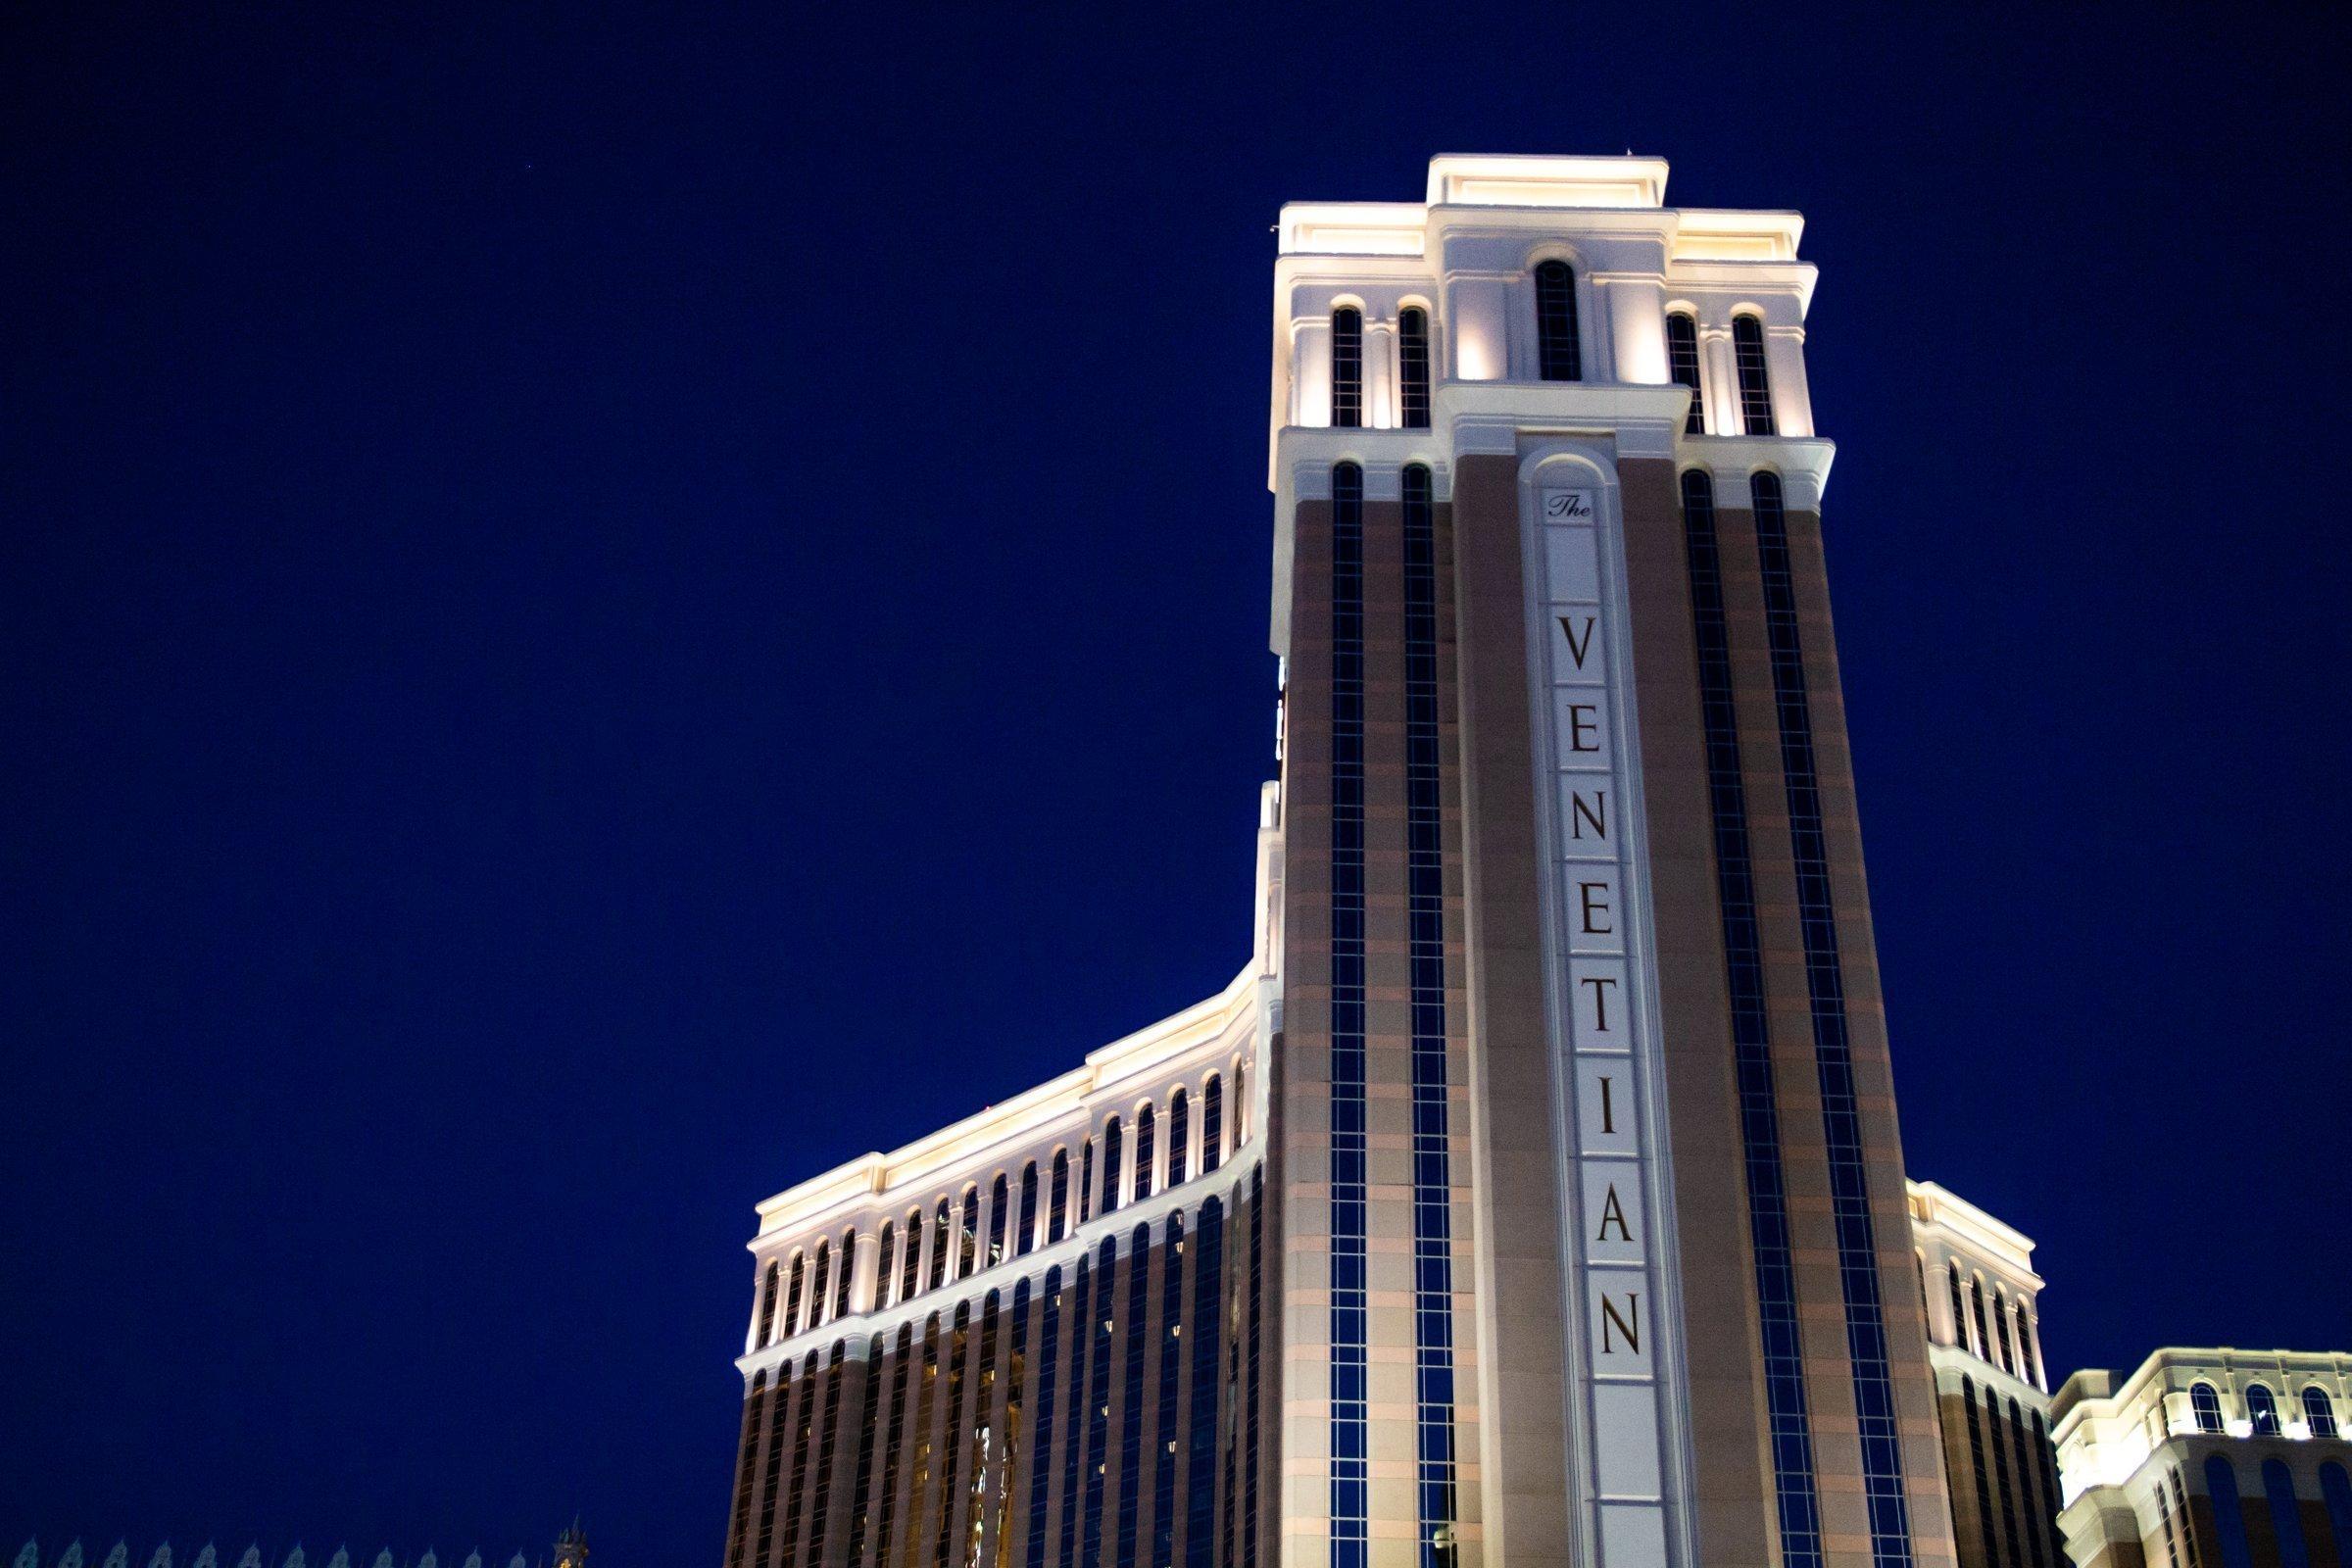 Illuminated The Venetian Hotel At Night